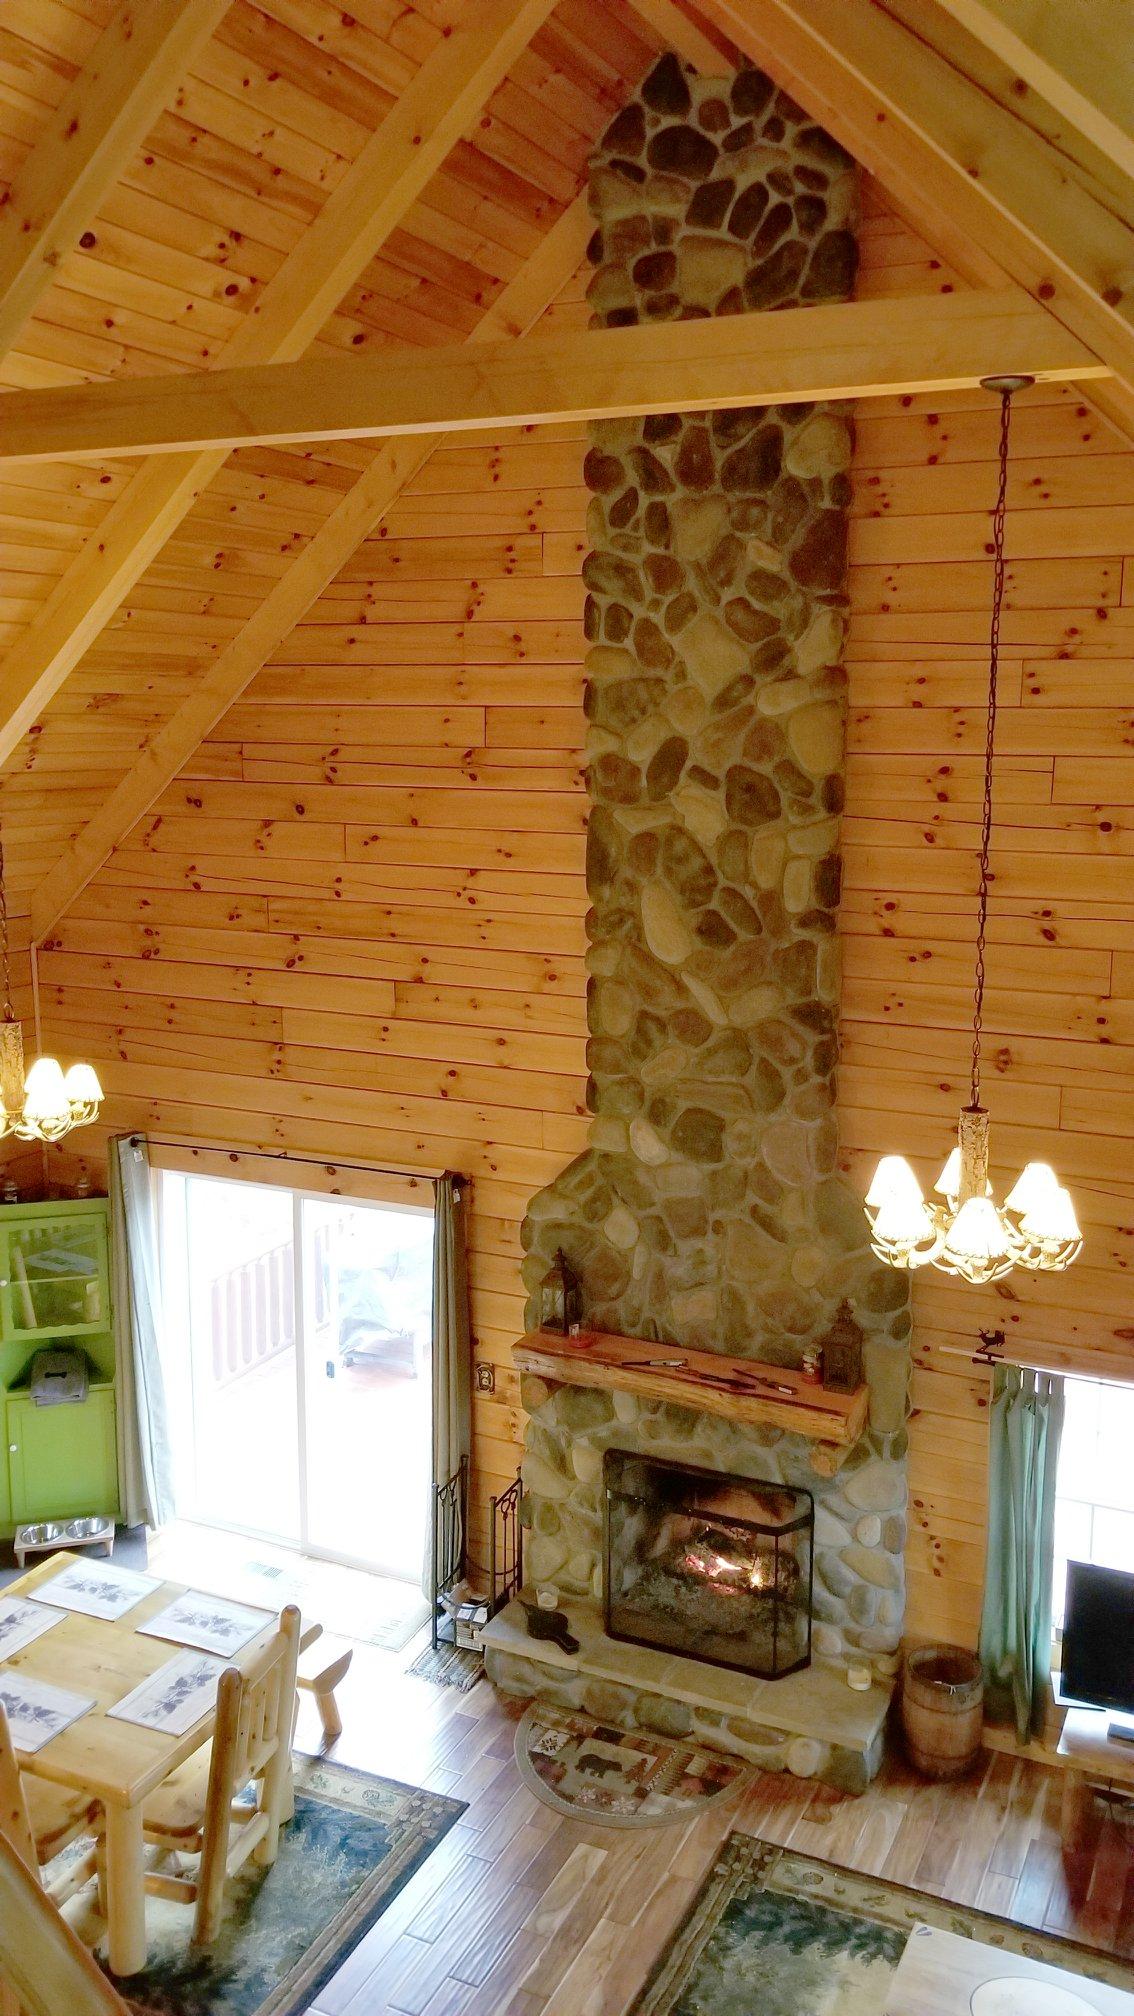 Fireplace - Cozy woodburning fireplace